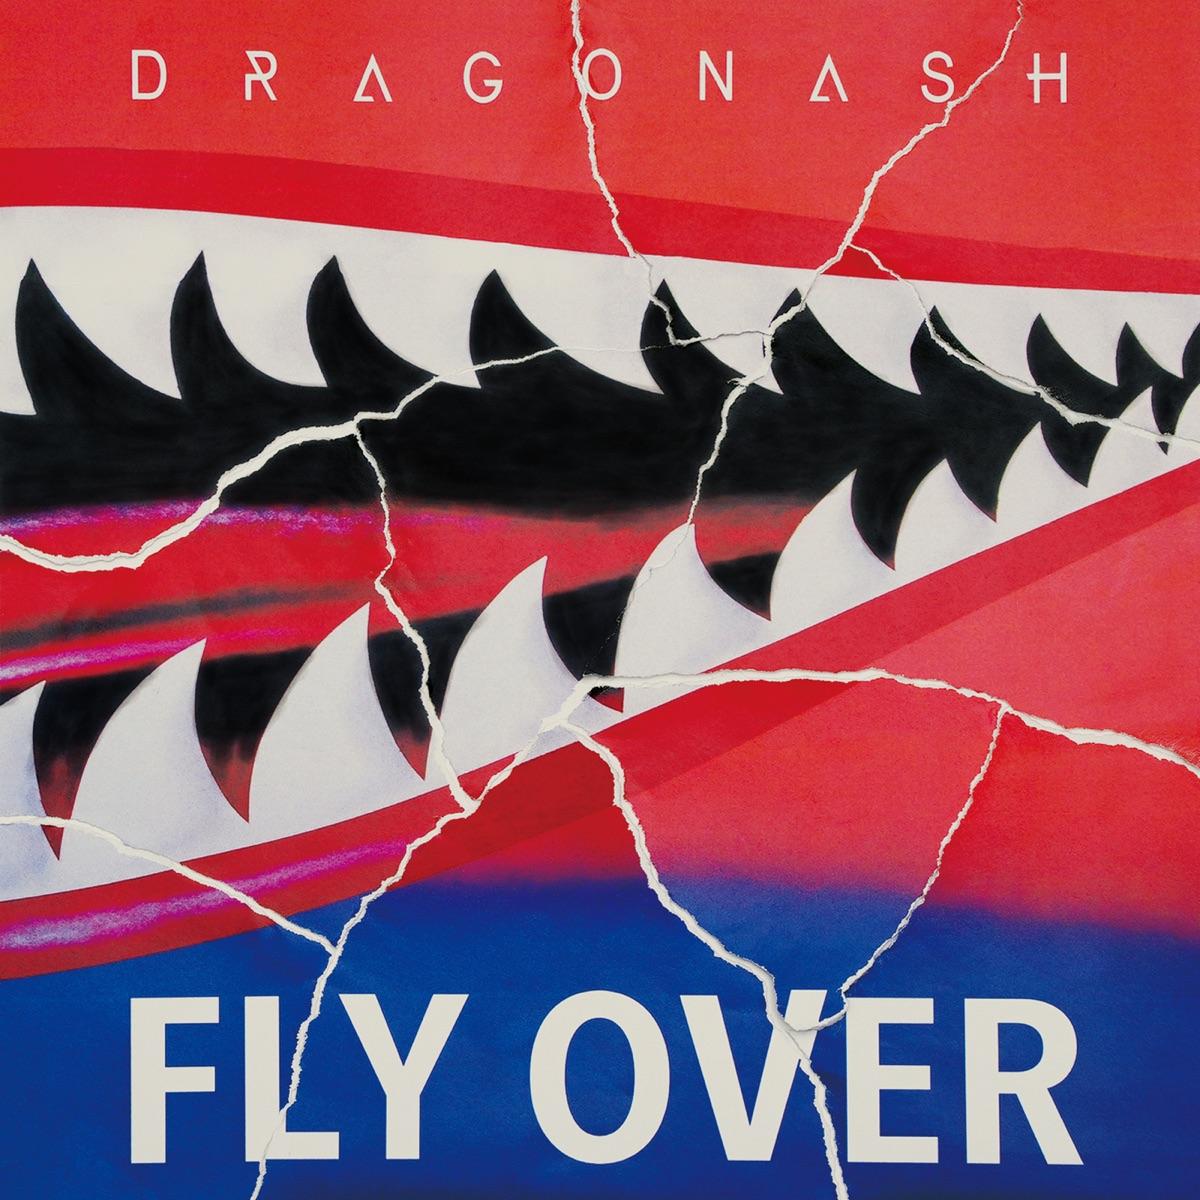 『Dragon Ash - Fly Over feat. T$UYO$HI』収録の『Fly Over feat. T$UYO$HI』ジャケット